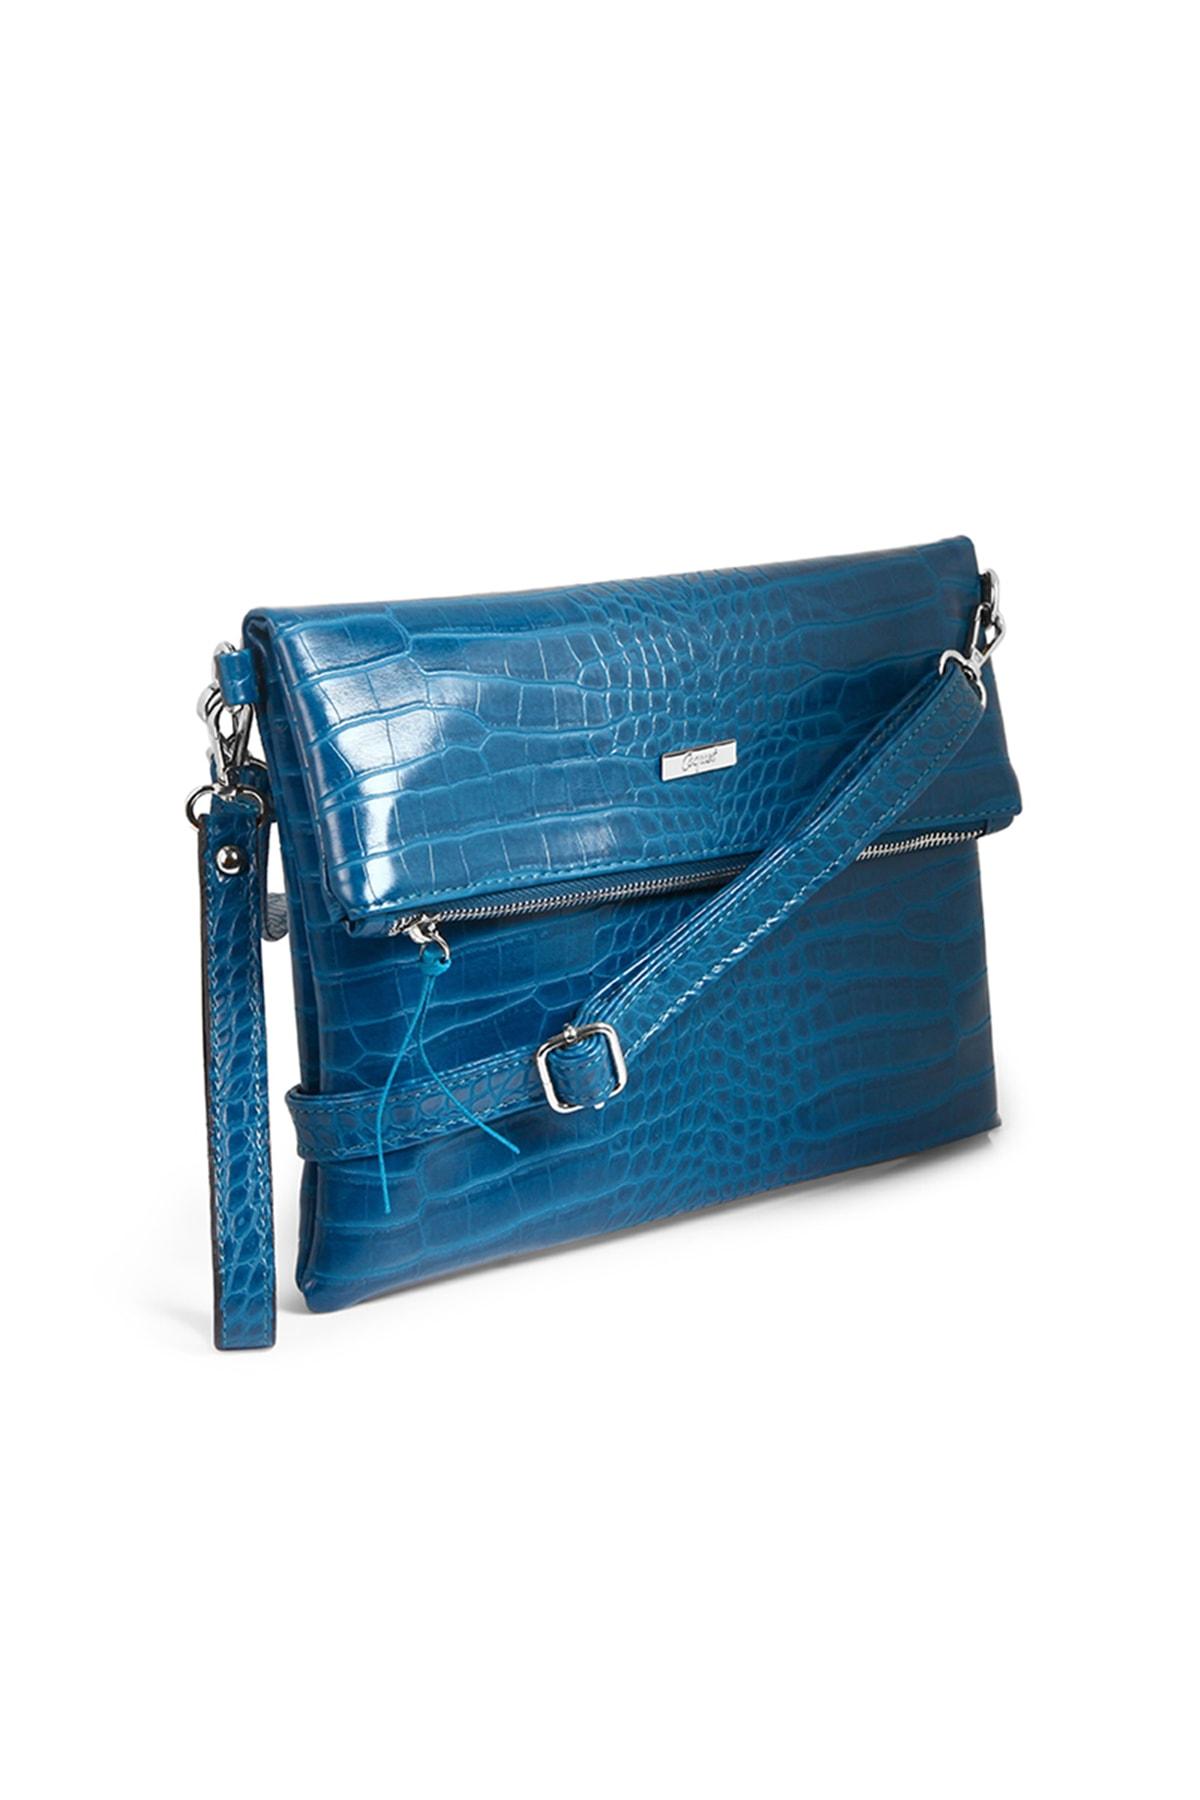 Coquet Accessories Kadın Koyu mavi Black Clutch 19G3U13N355 2